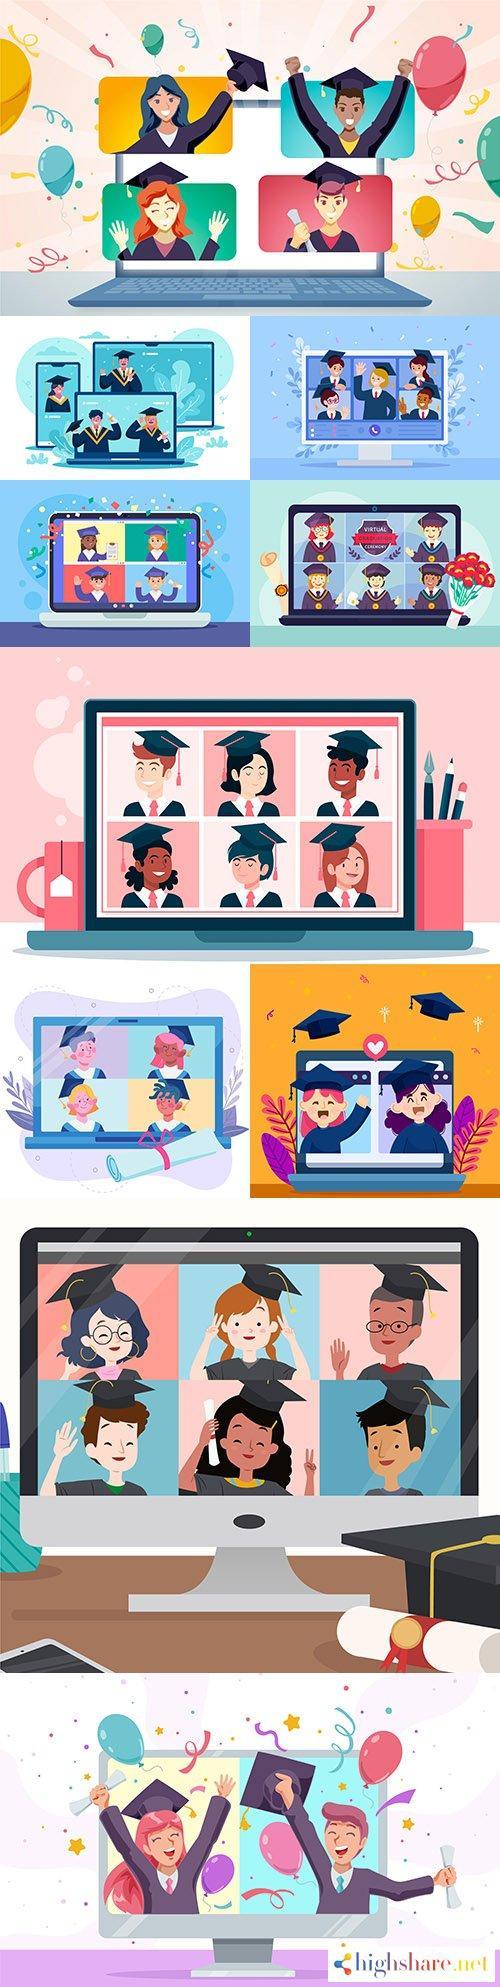 virtual graduation award ceremony concept illustrations 5f4000c9a5c38 - Virtual graduation award ceremony concept illustrations